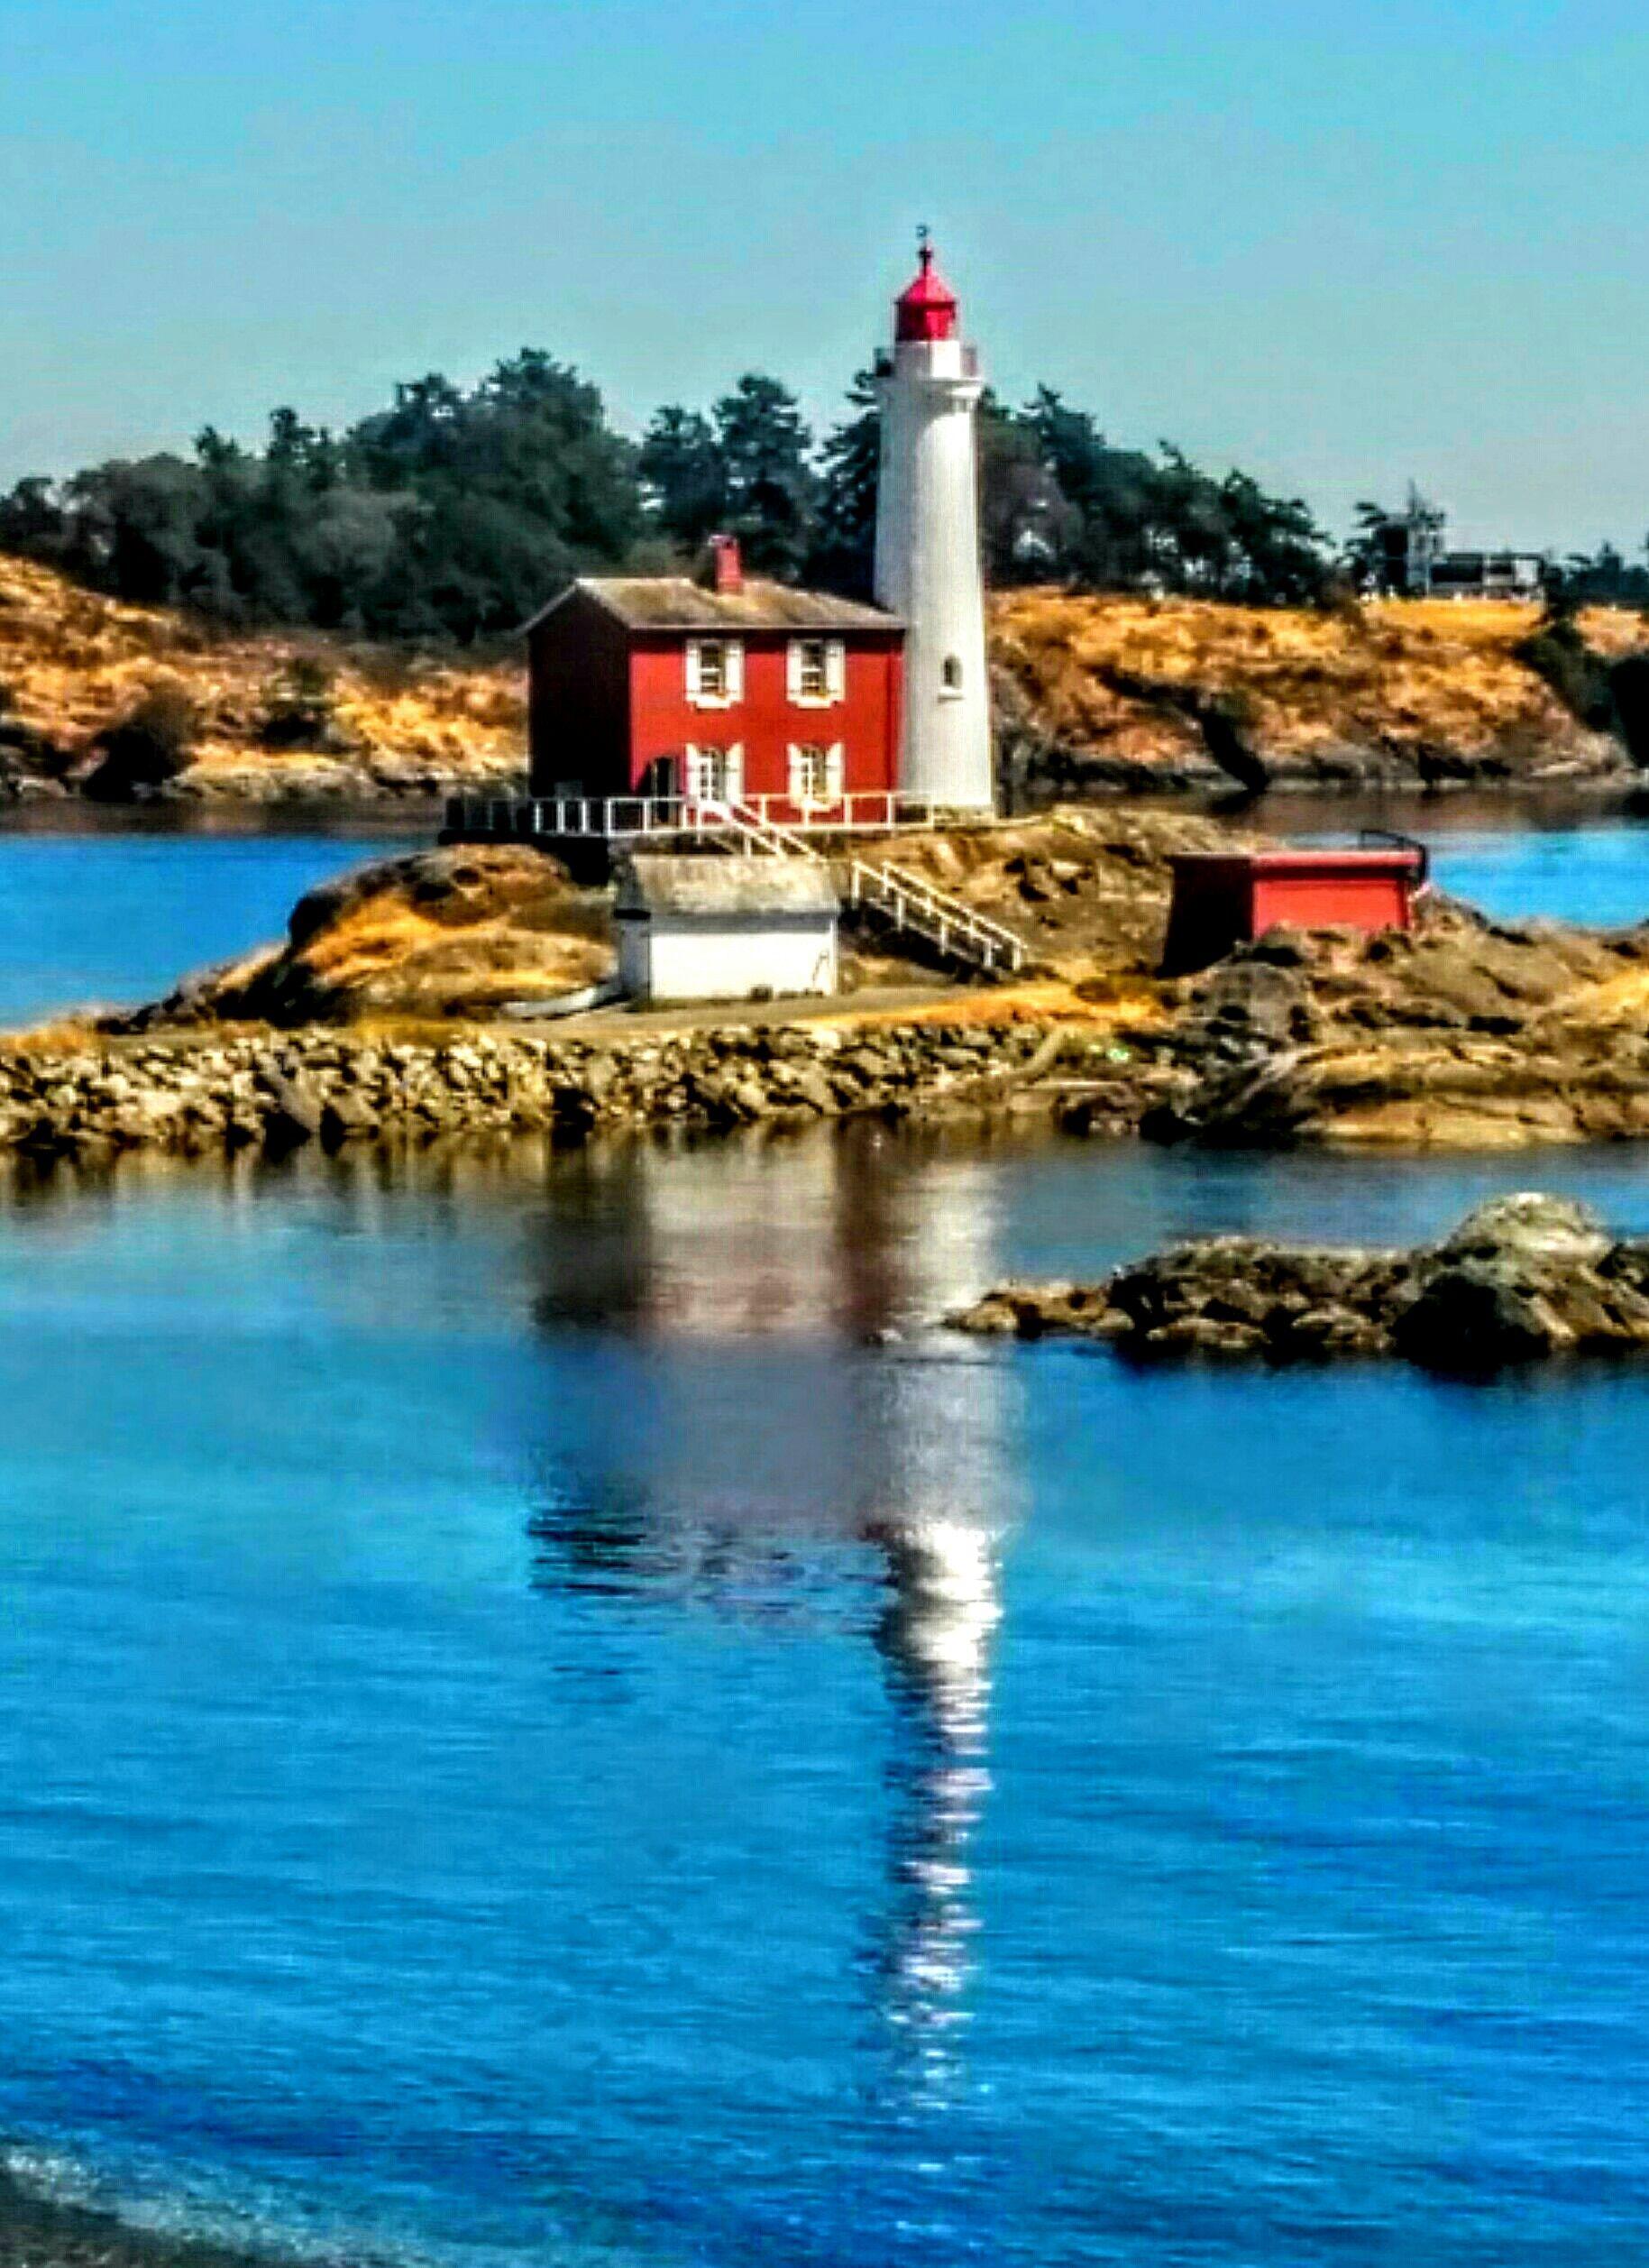 Fisgard Lighthouse at Fort Rodd Hill, Victoria BC.  Photo by Dennis Jenson